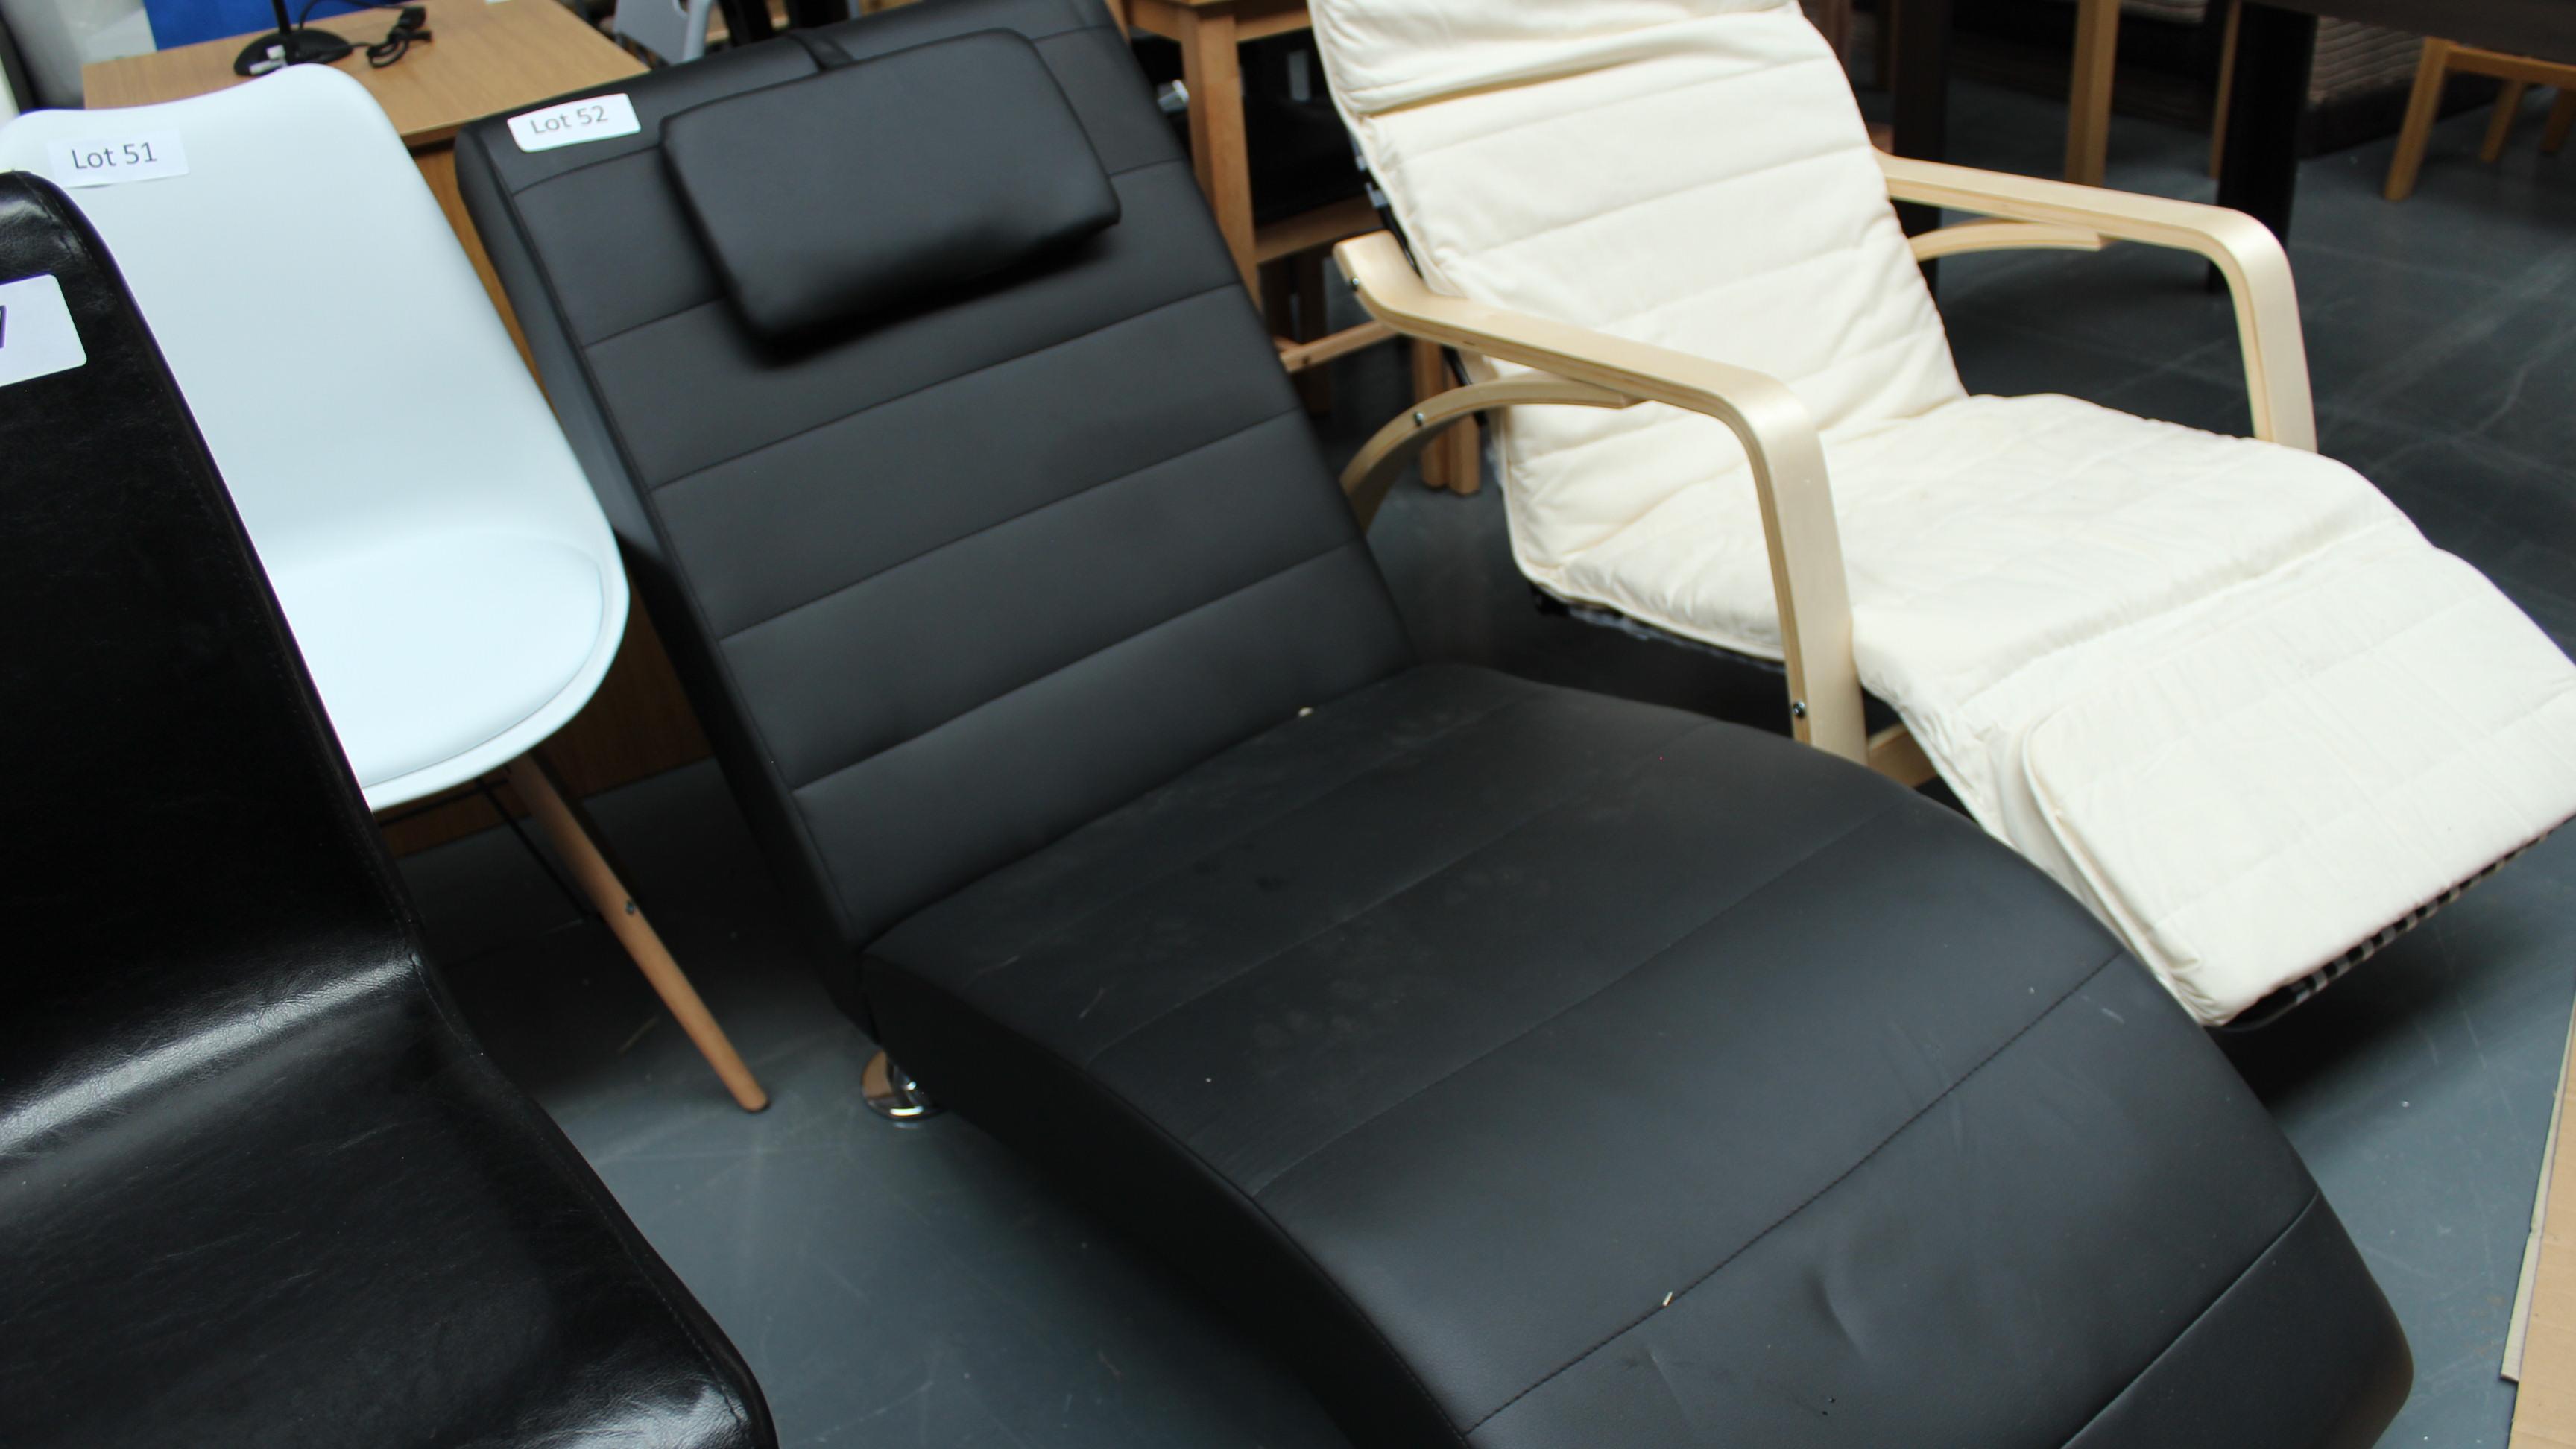 Lot 52 - Black Chaise Longue. Customer Returns